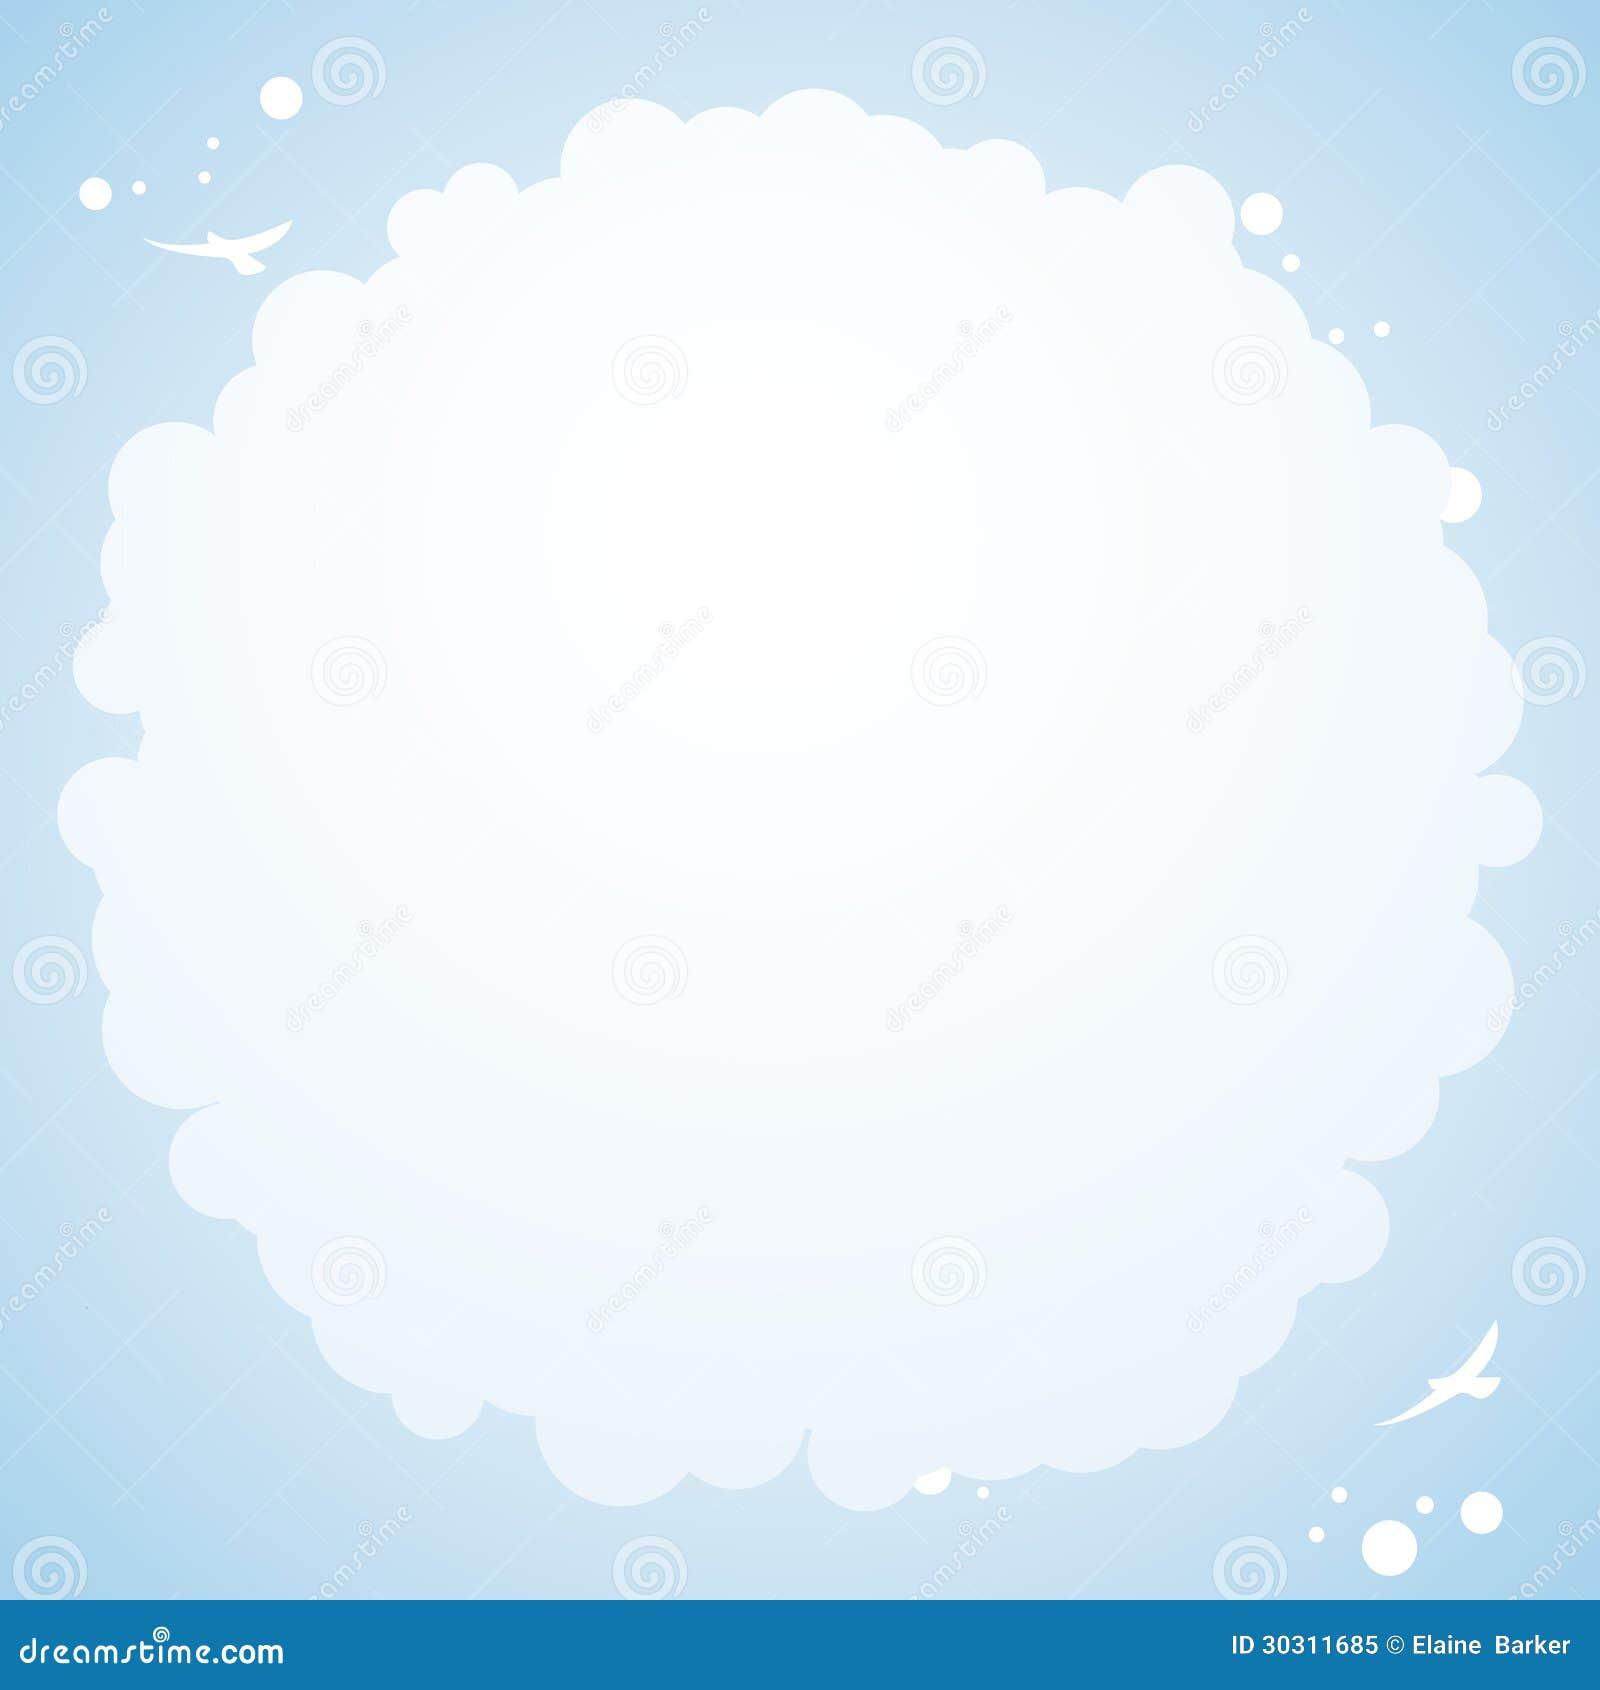 Cloud Cirular Borderborder Background Royalty Free Stock Photo Image 30311685